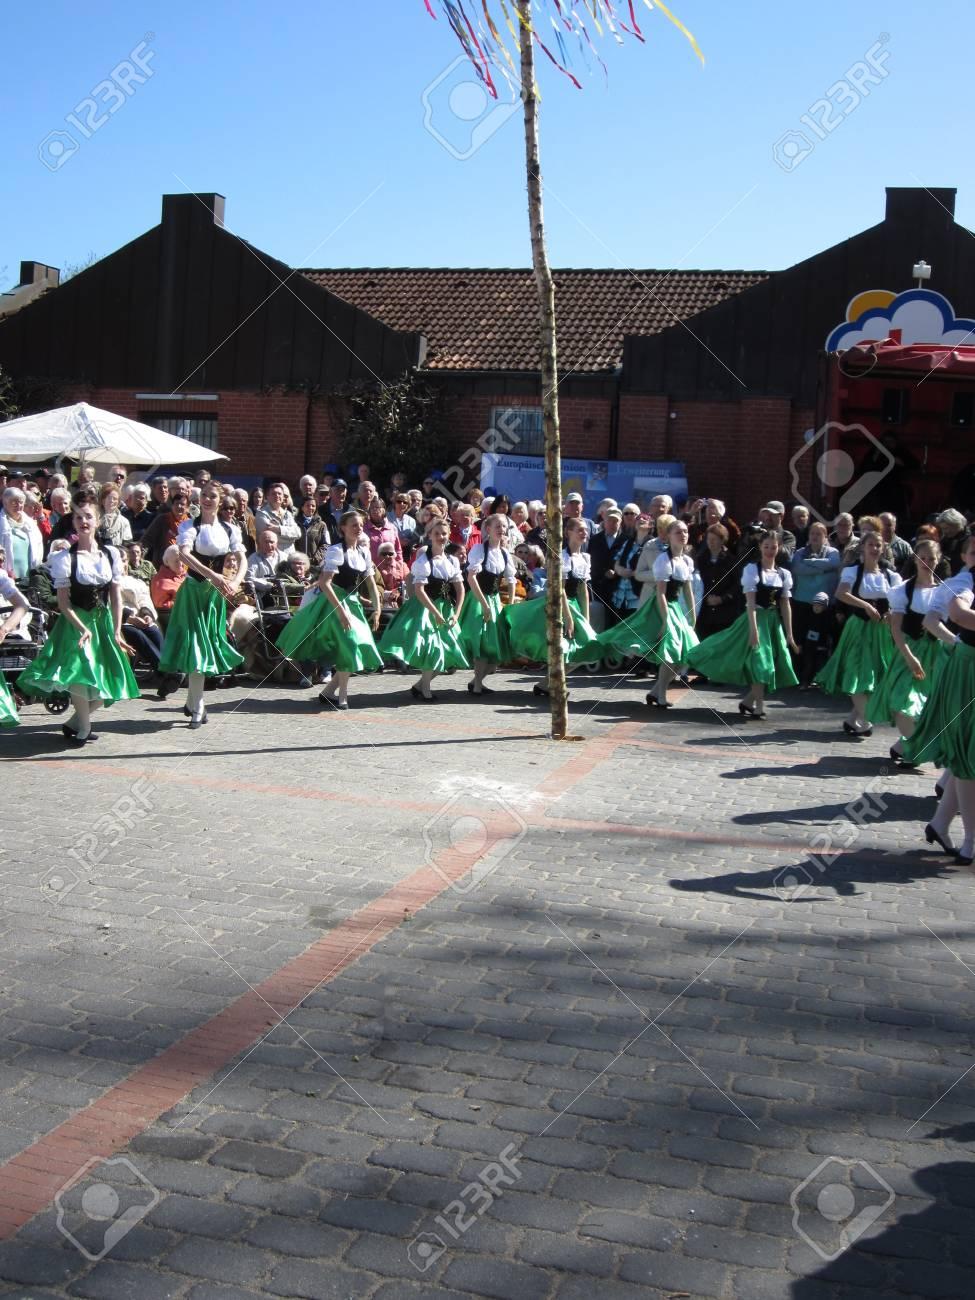 Dancing around the maypole Stock Photo - 24048105